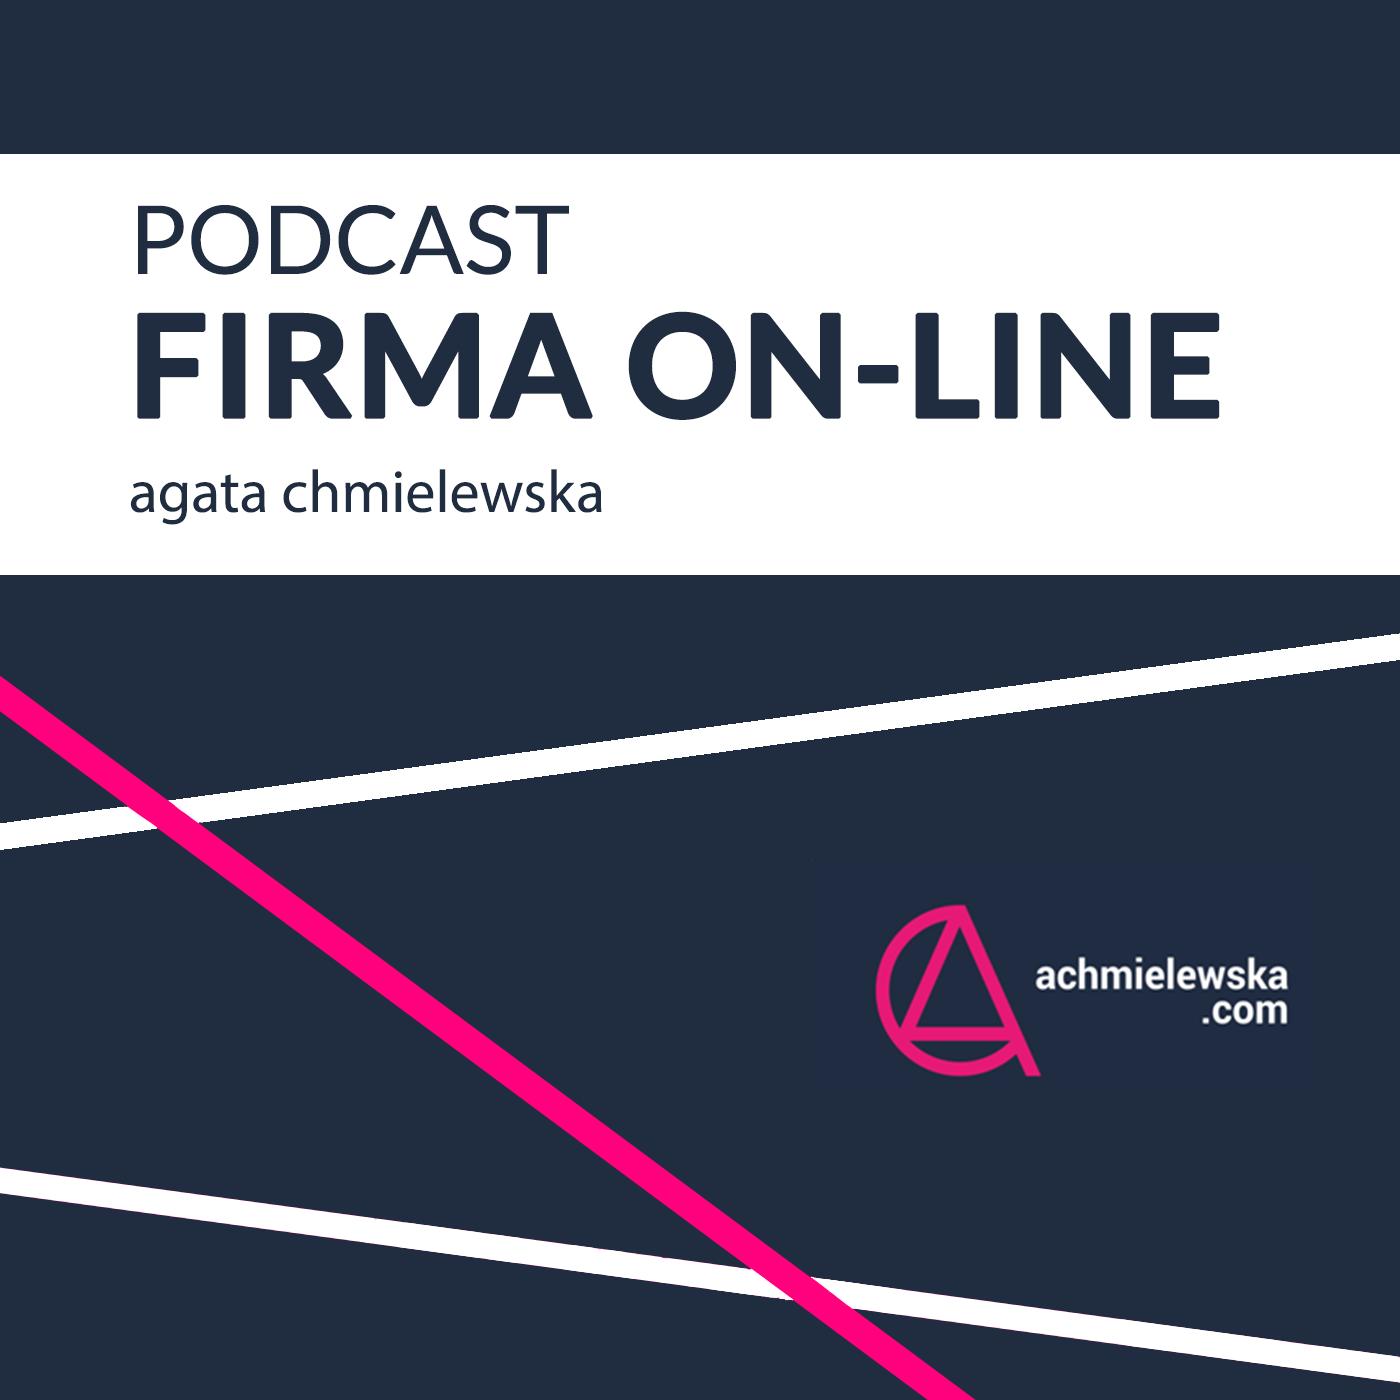 FIRMA ON-LINE